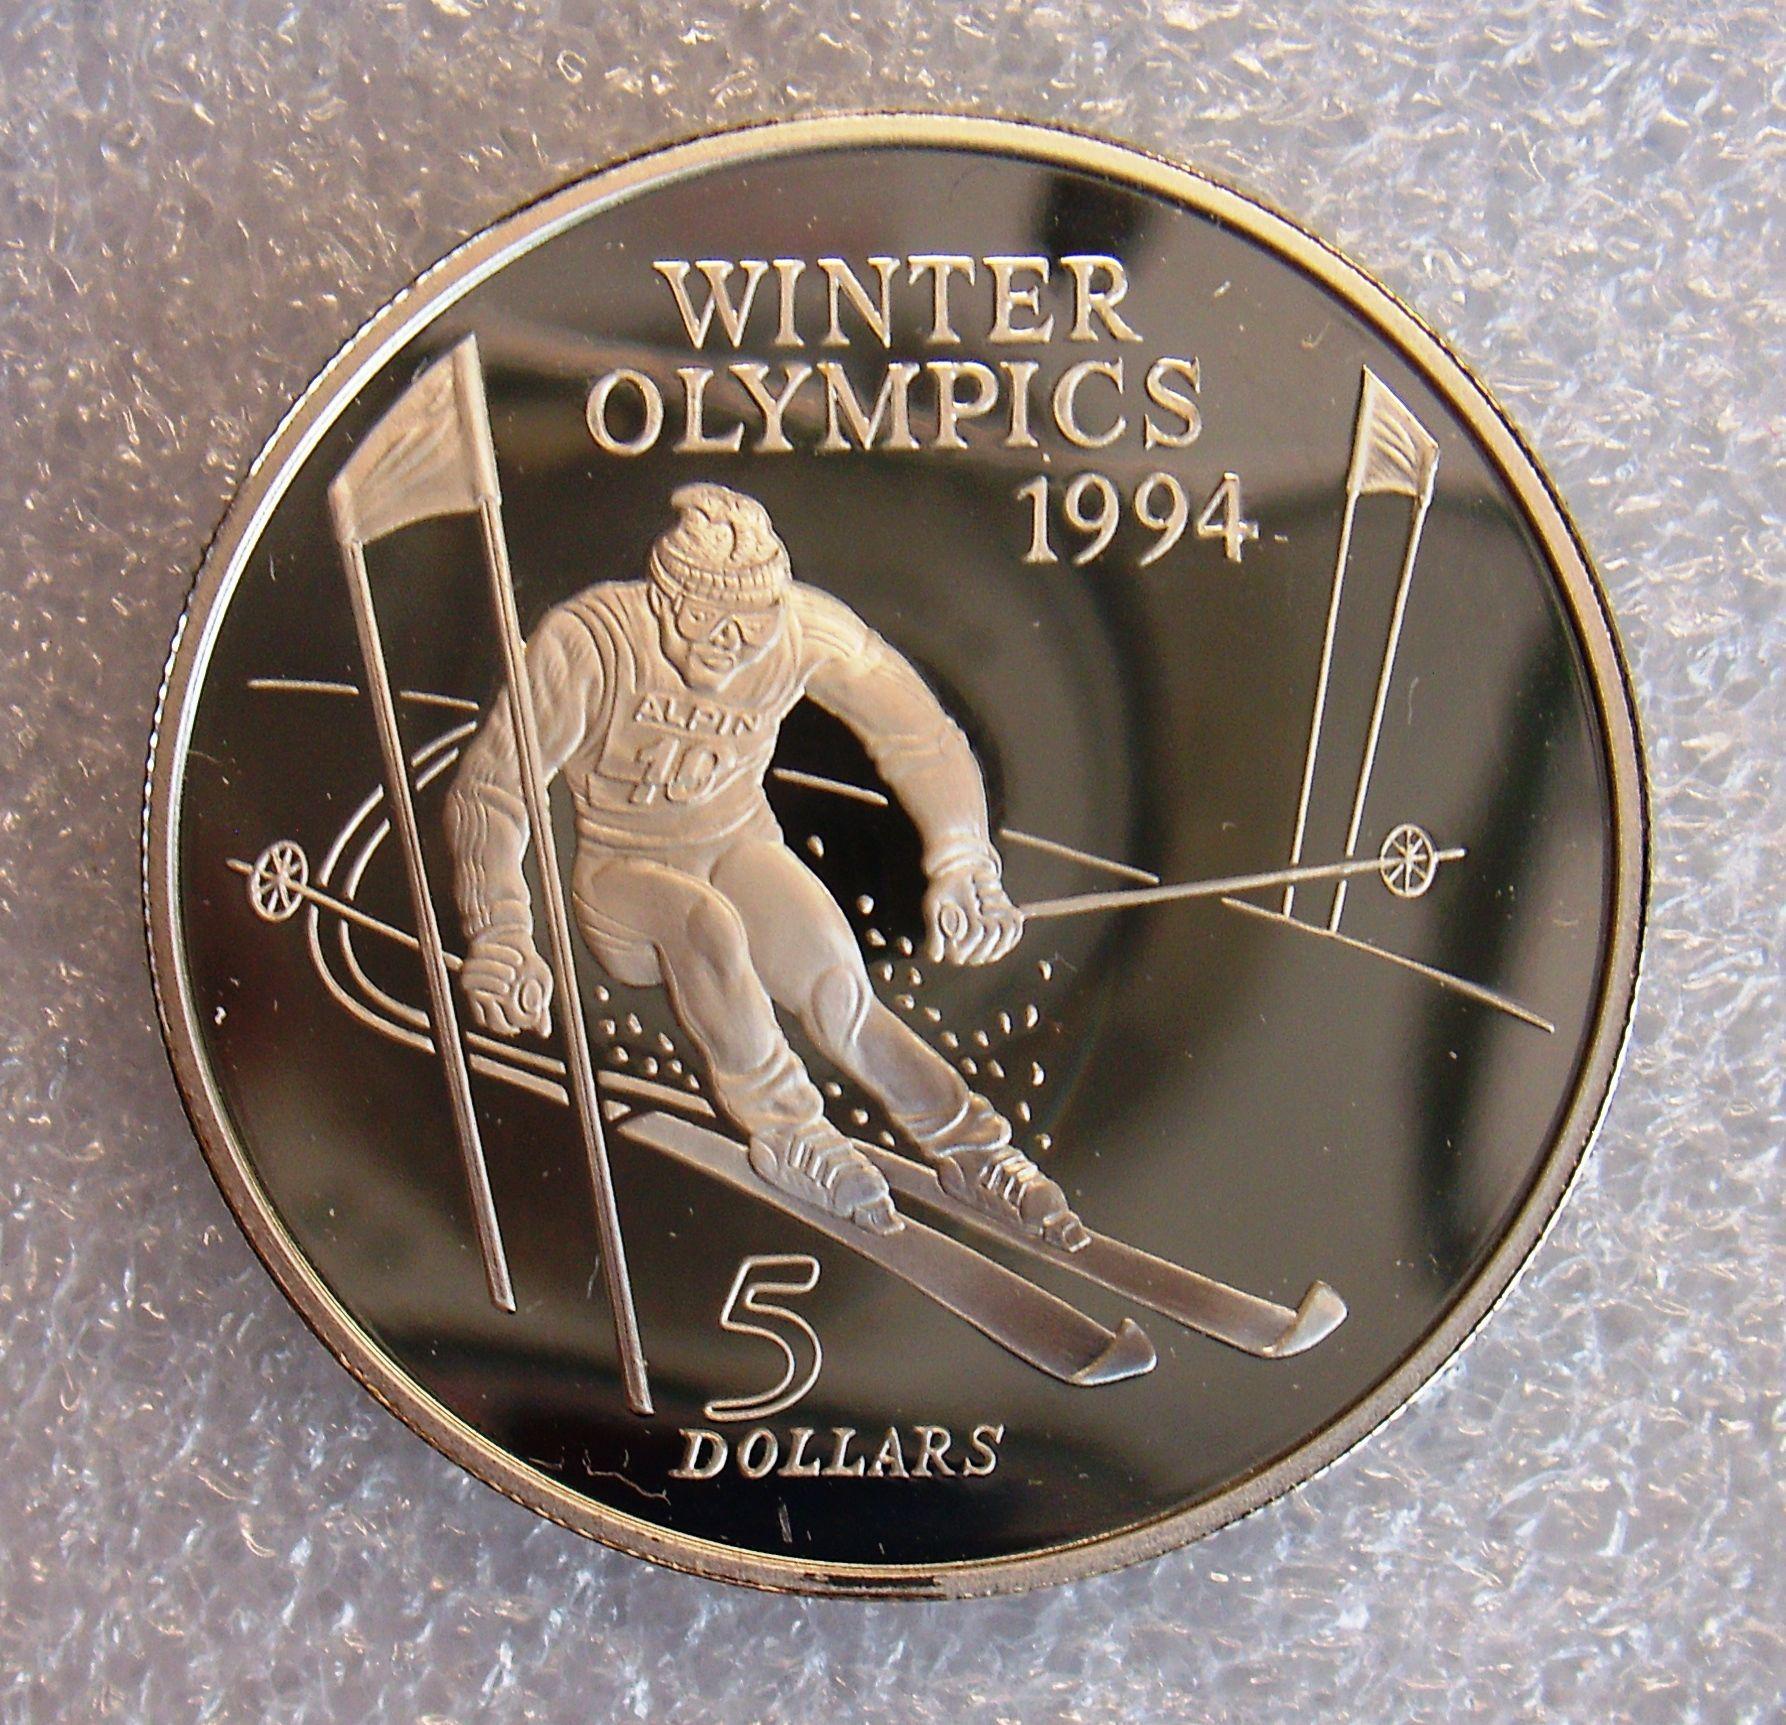 New zealand, 5 dollars, QP silver coin .925, 1994, winter